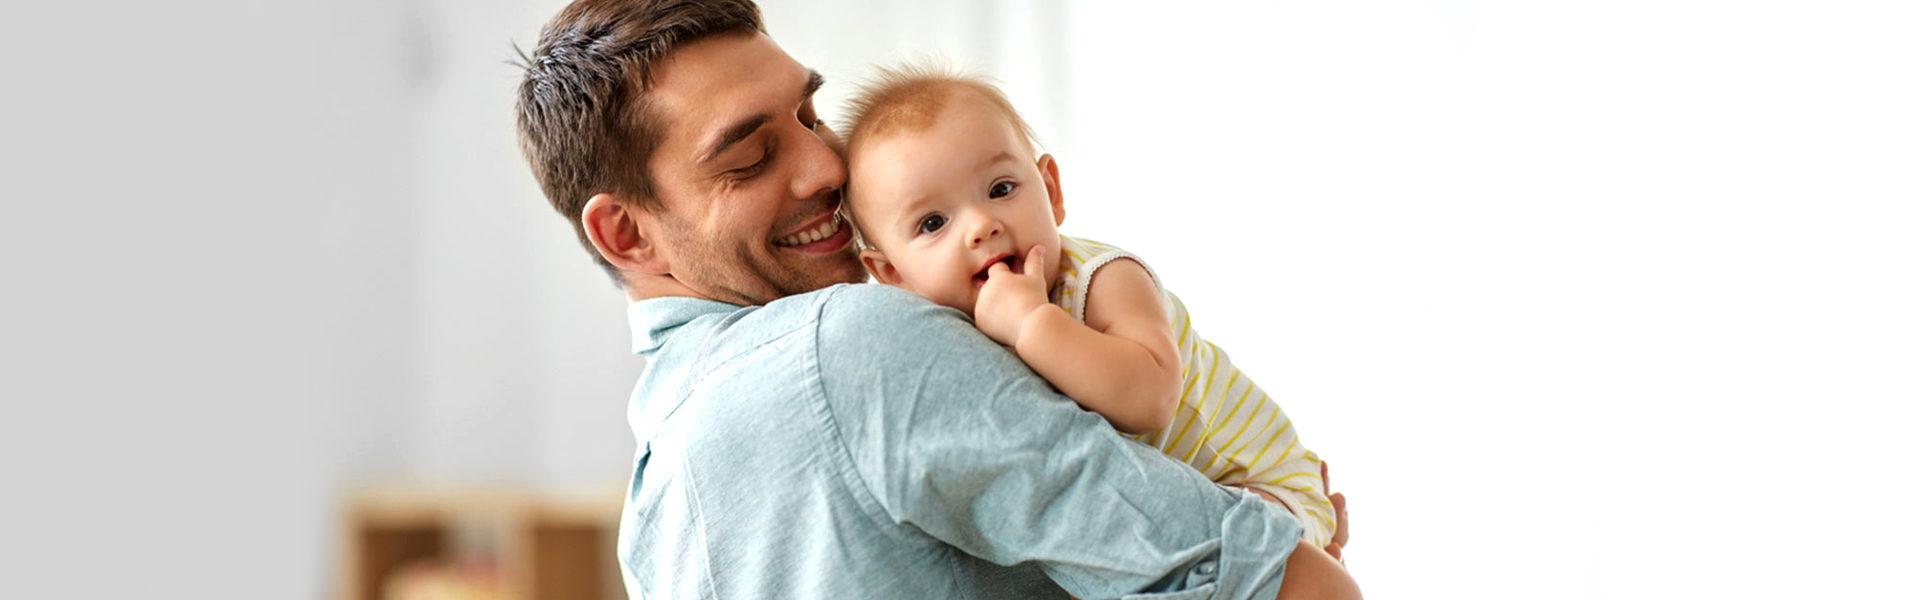 Infants Care